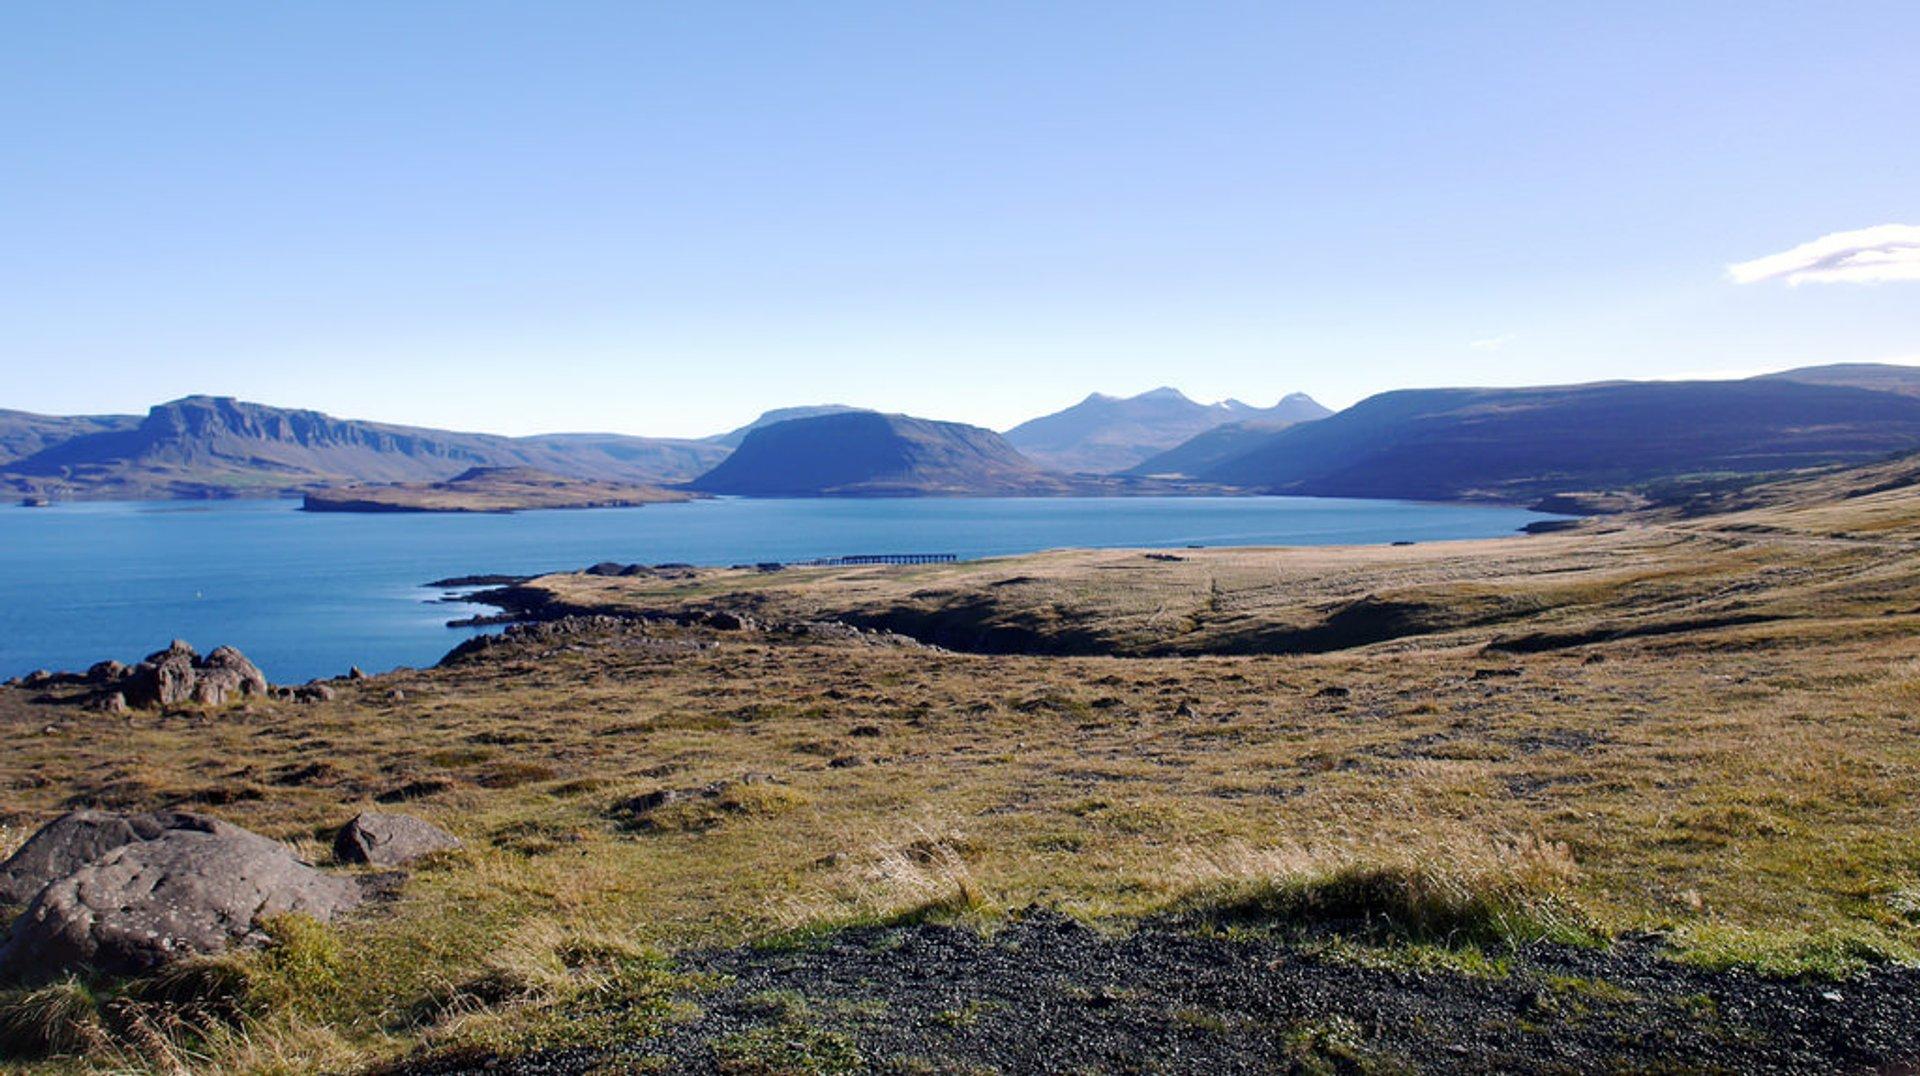 Snæfellsnes Peninsula in Iceland 2020 - Best Time